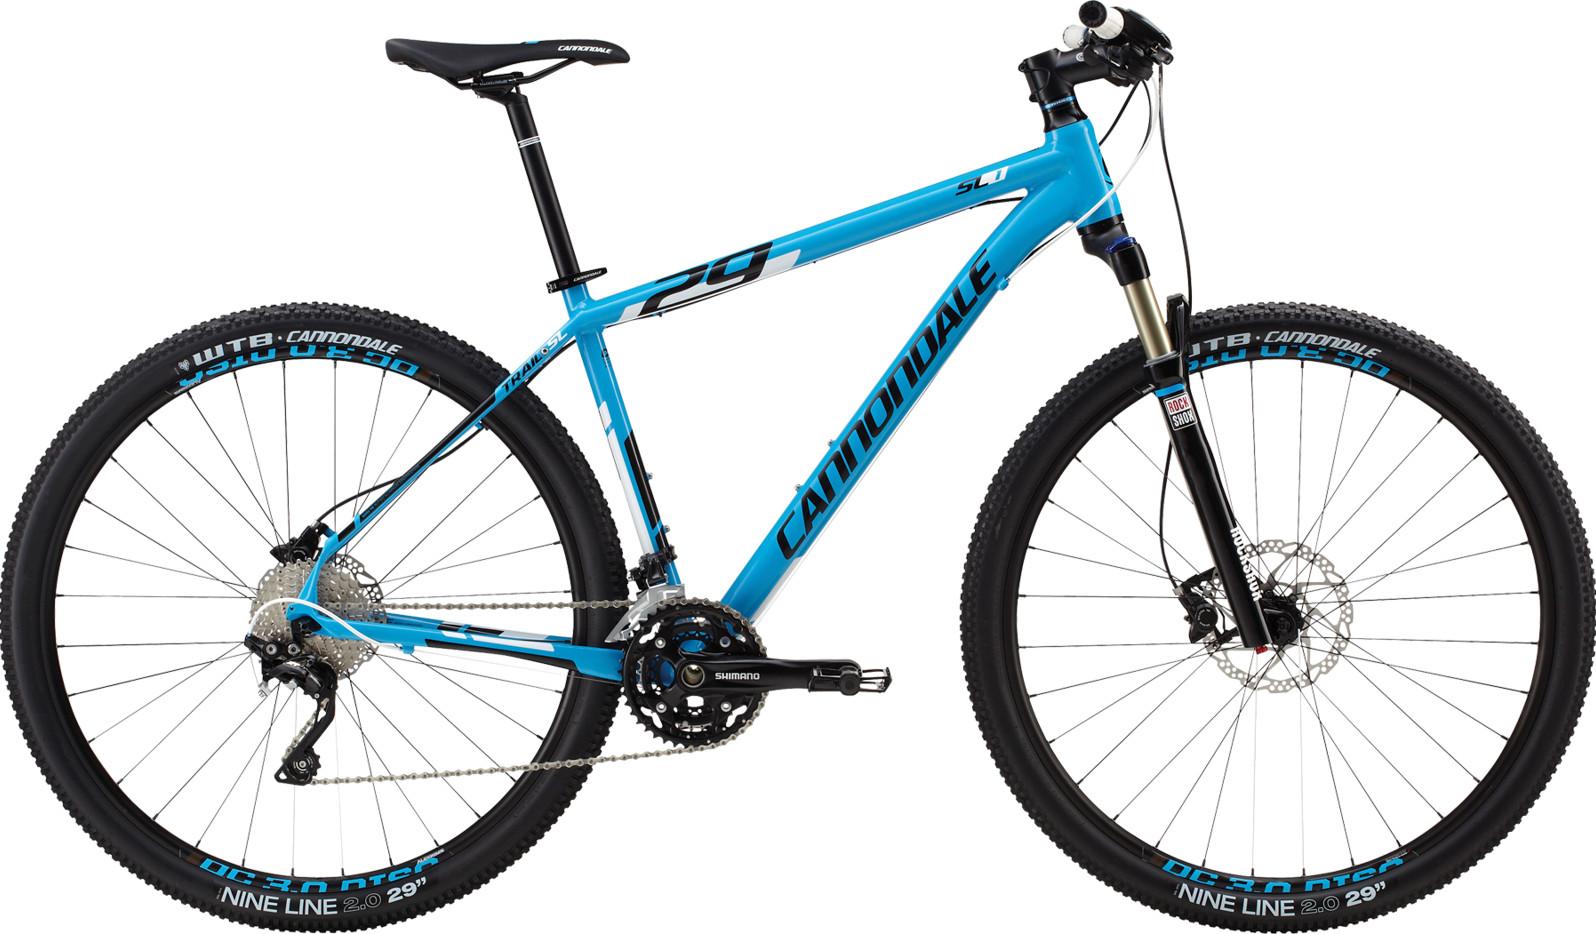 bike - 2014 Cannondale Trail SL 29 1 - blue